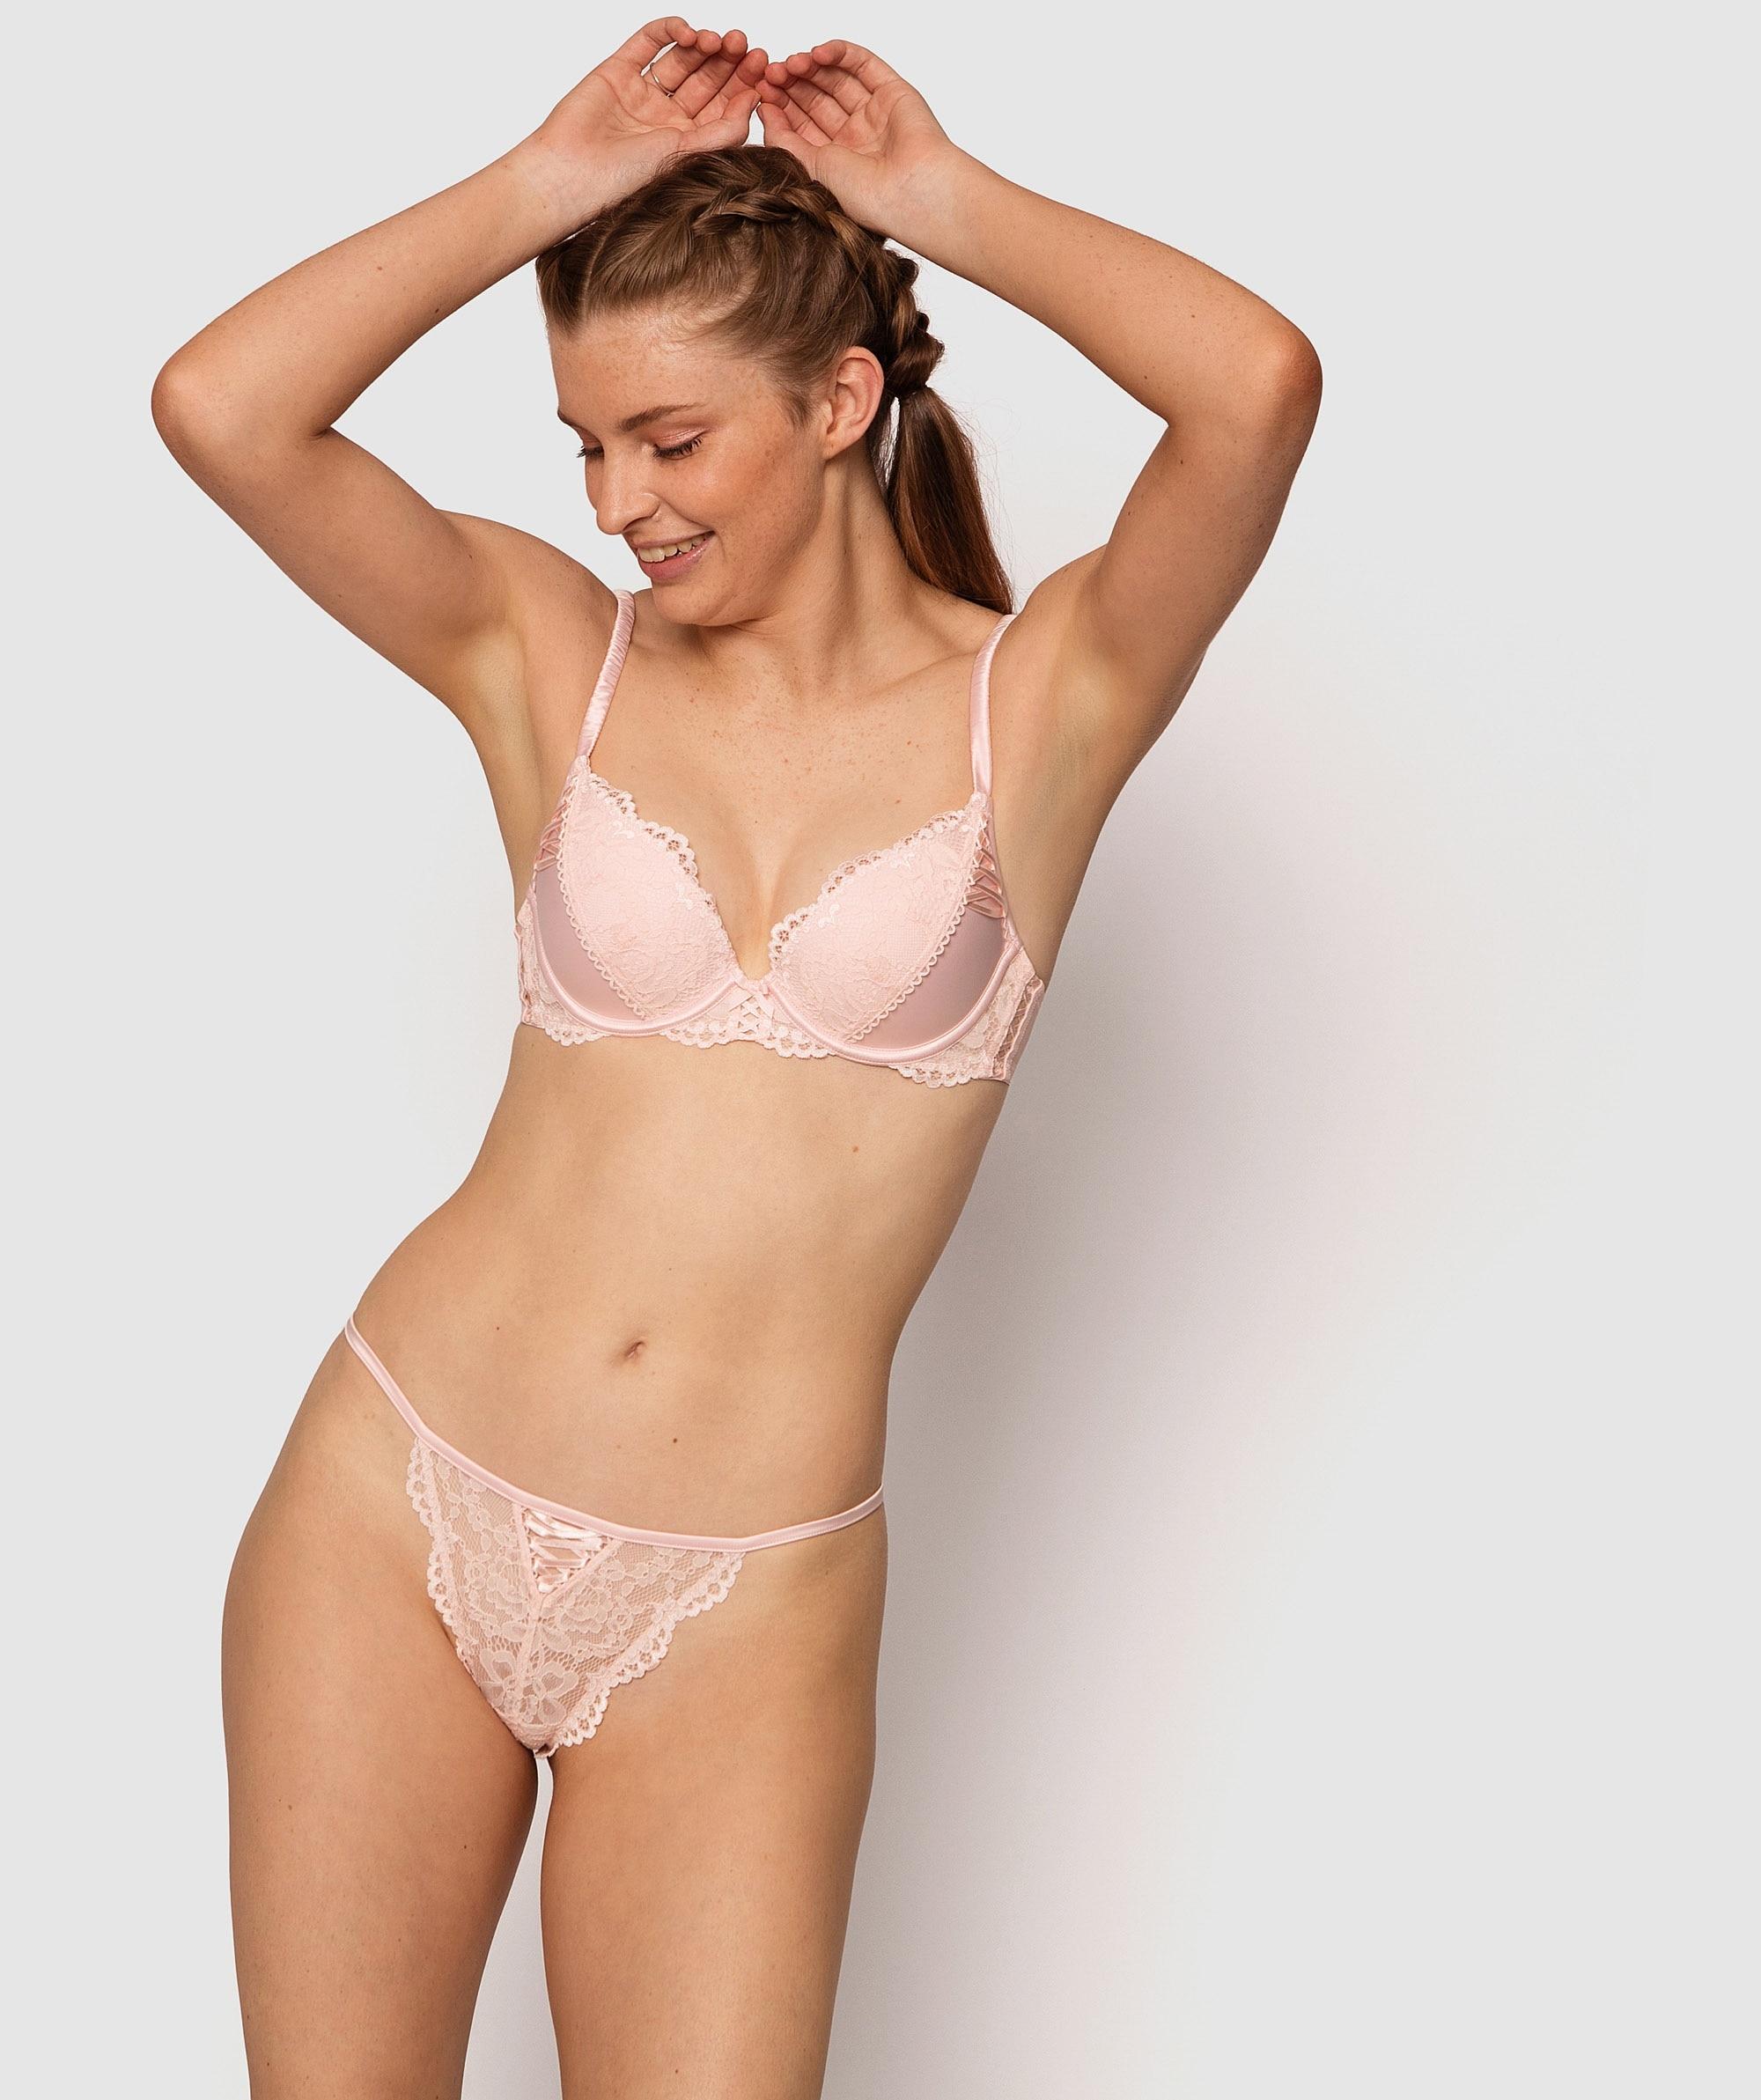 Farran Plunge Push Up Bra - Light Pink